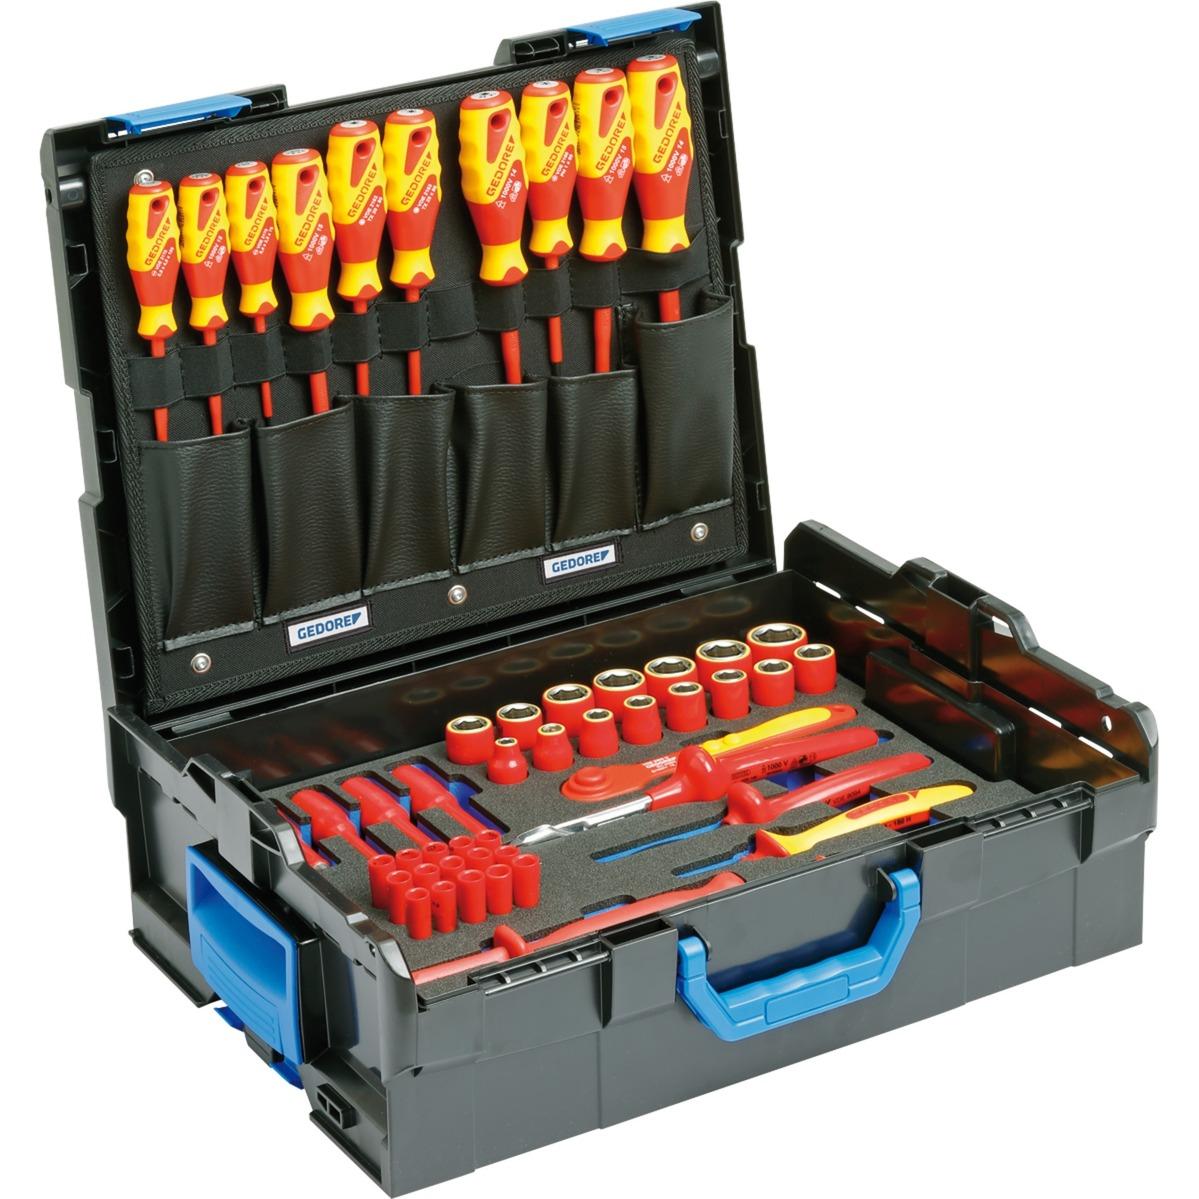 2979063, Kit de herramientas